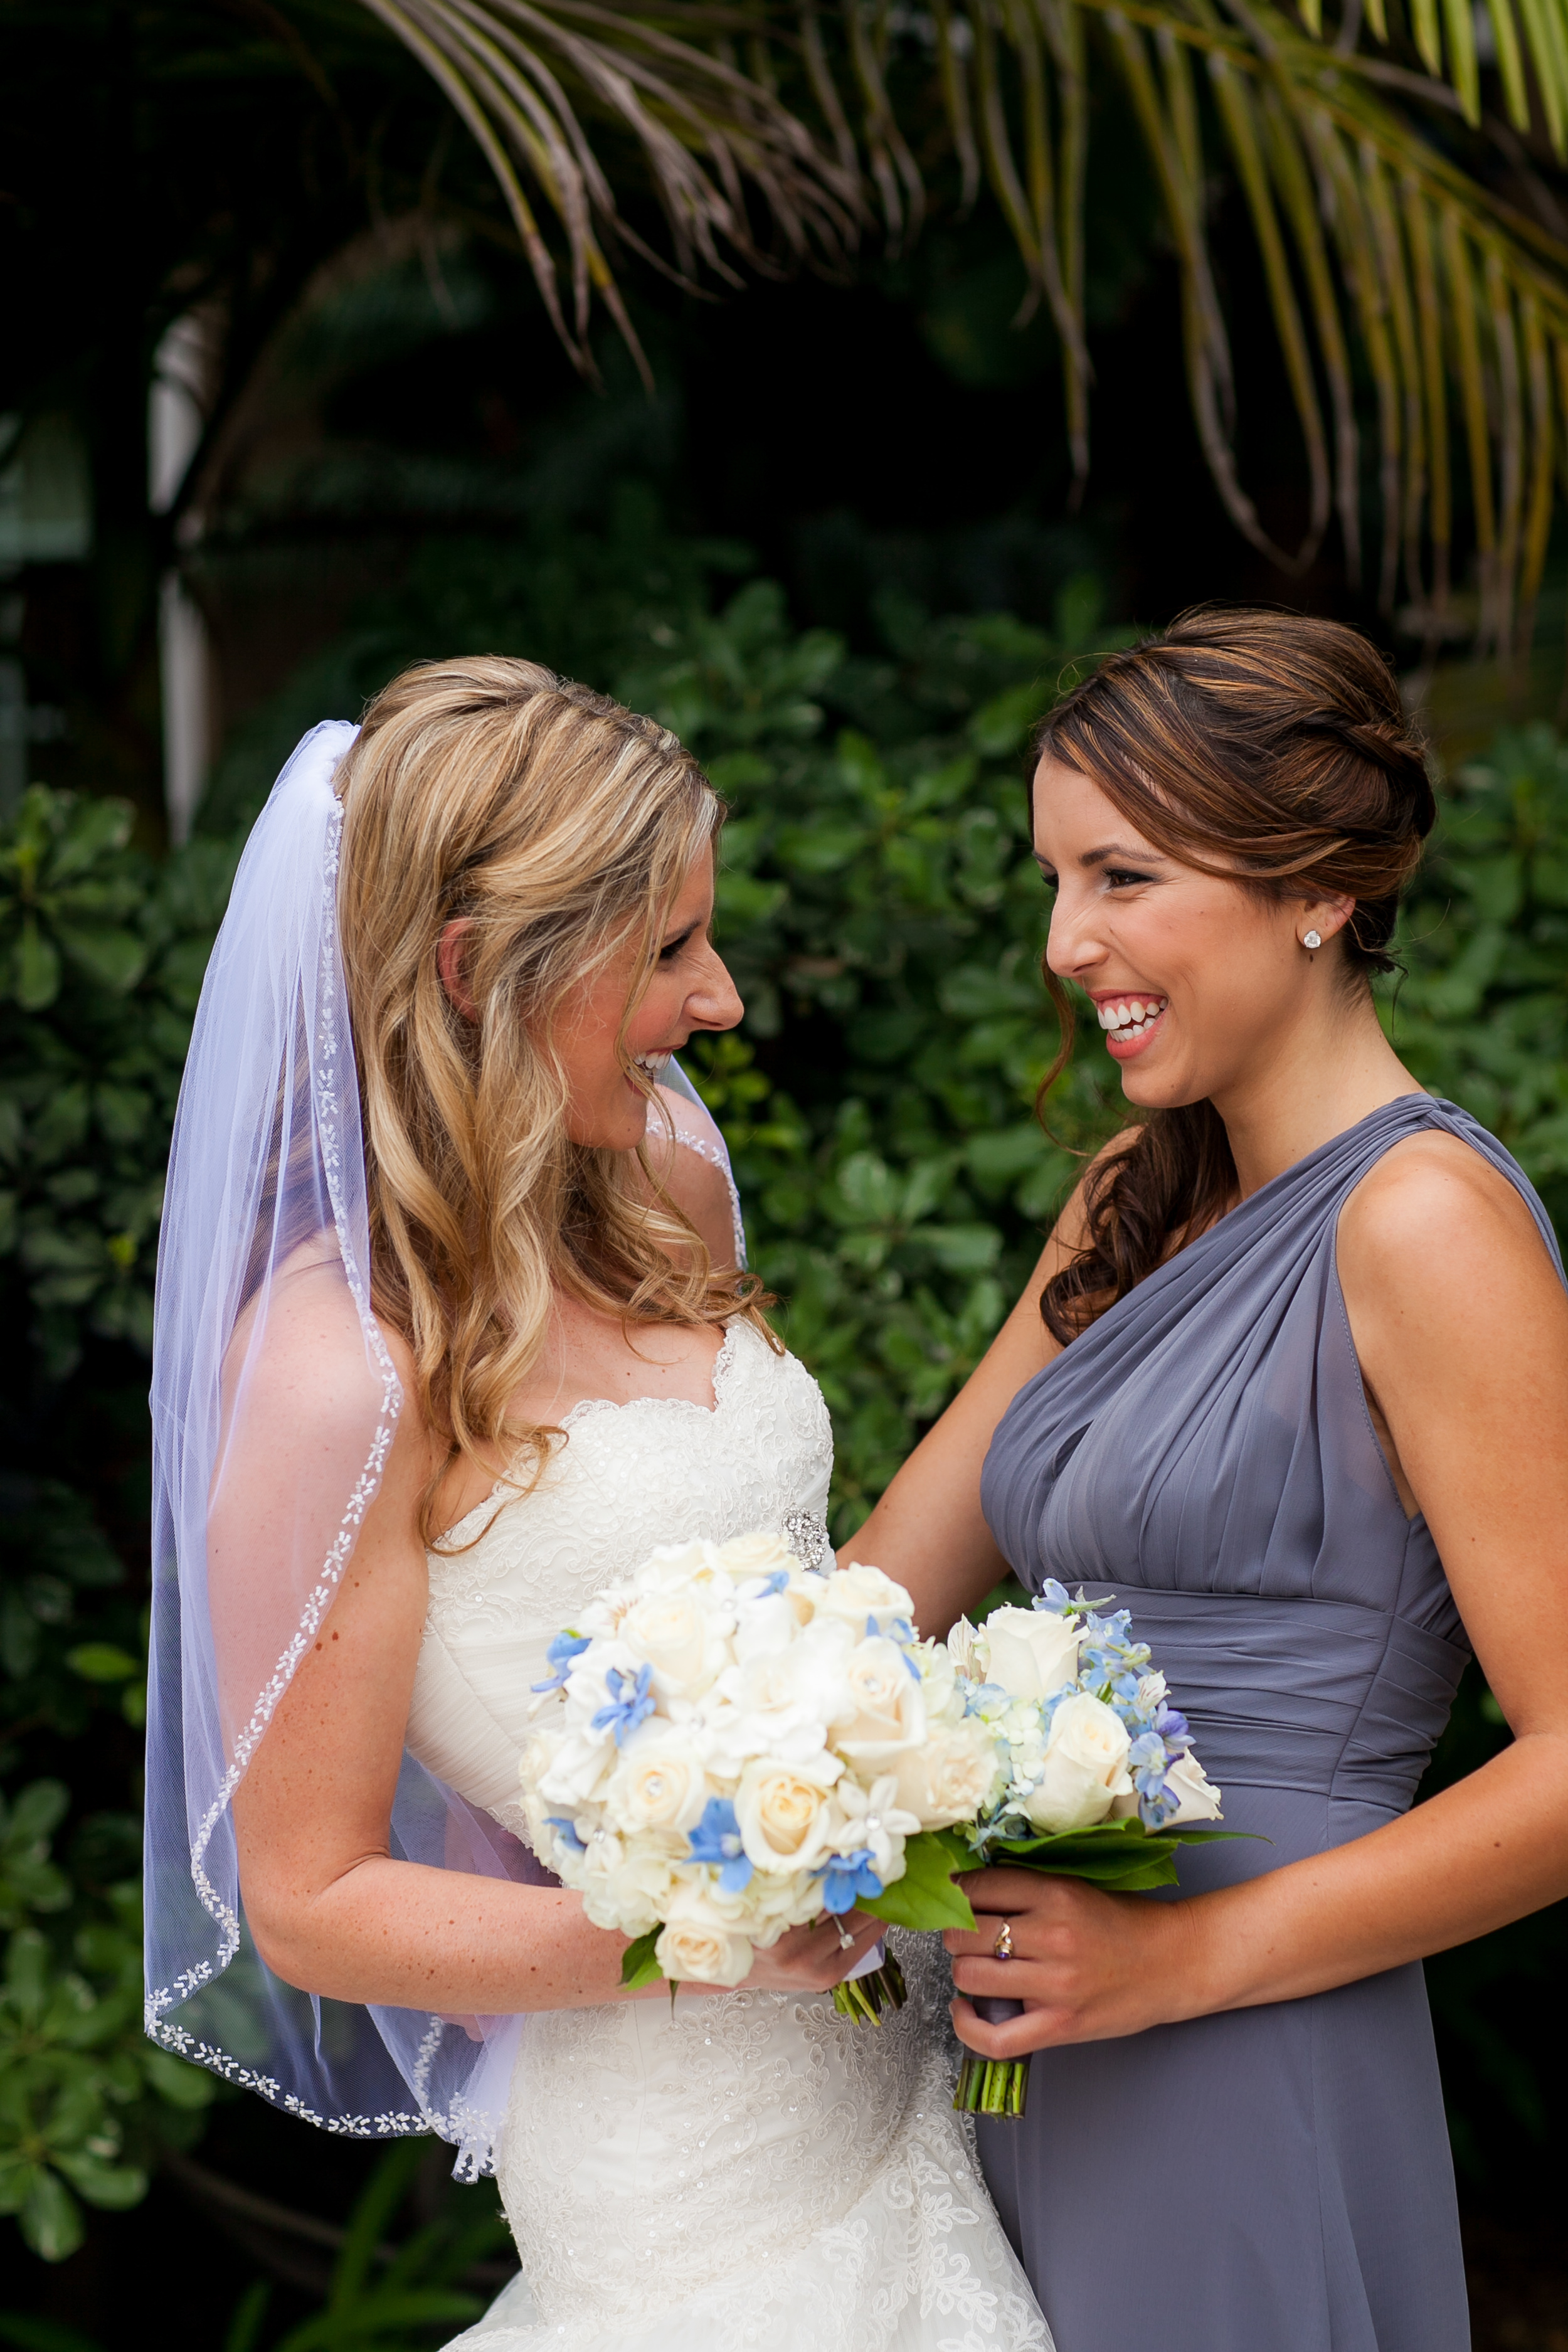 The Overwhelmed Bride Wedding Blog + Southern Californai Wedding Planner